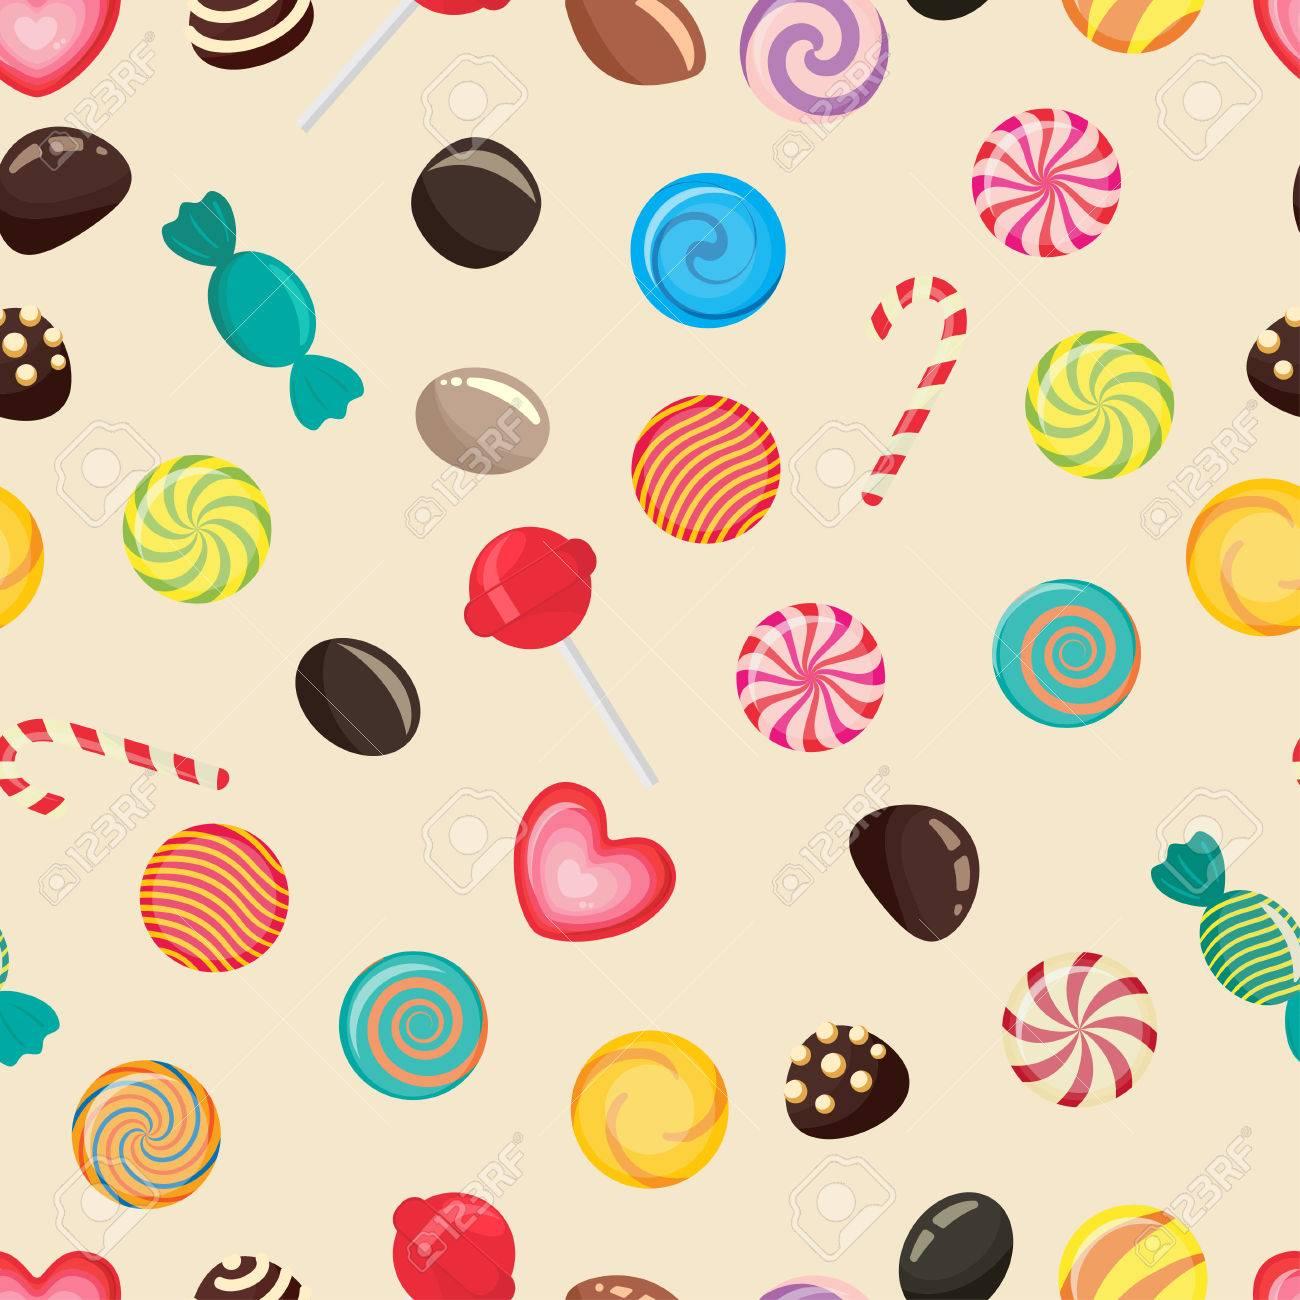 Sweet Candy Seamless Pattern, Caramel Lollipop Texture, Colored ...